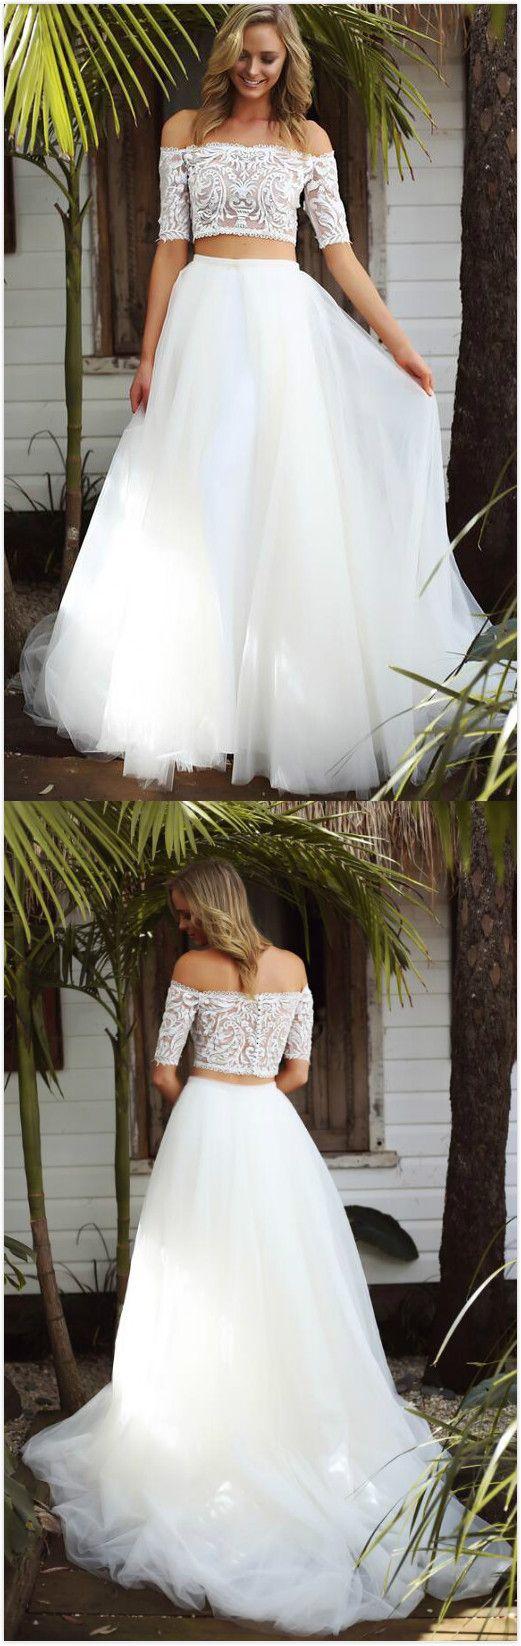 Twopiece prom dressoff shoulder half sleeves prom dresscheap prom